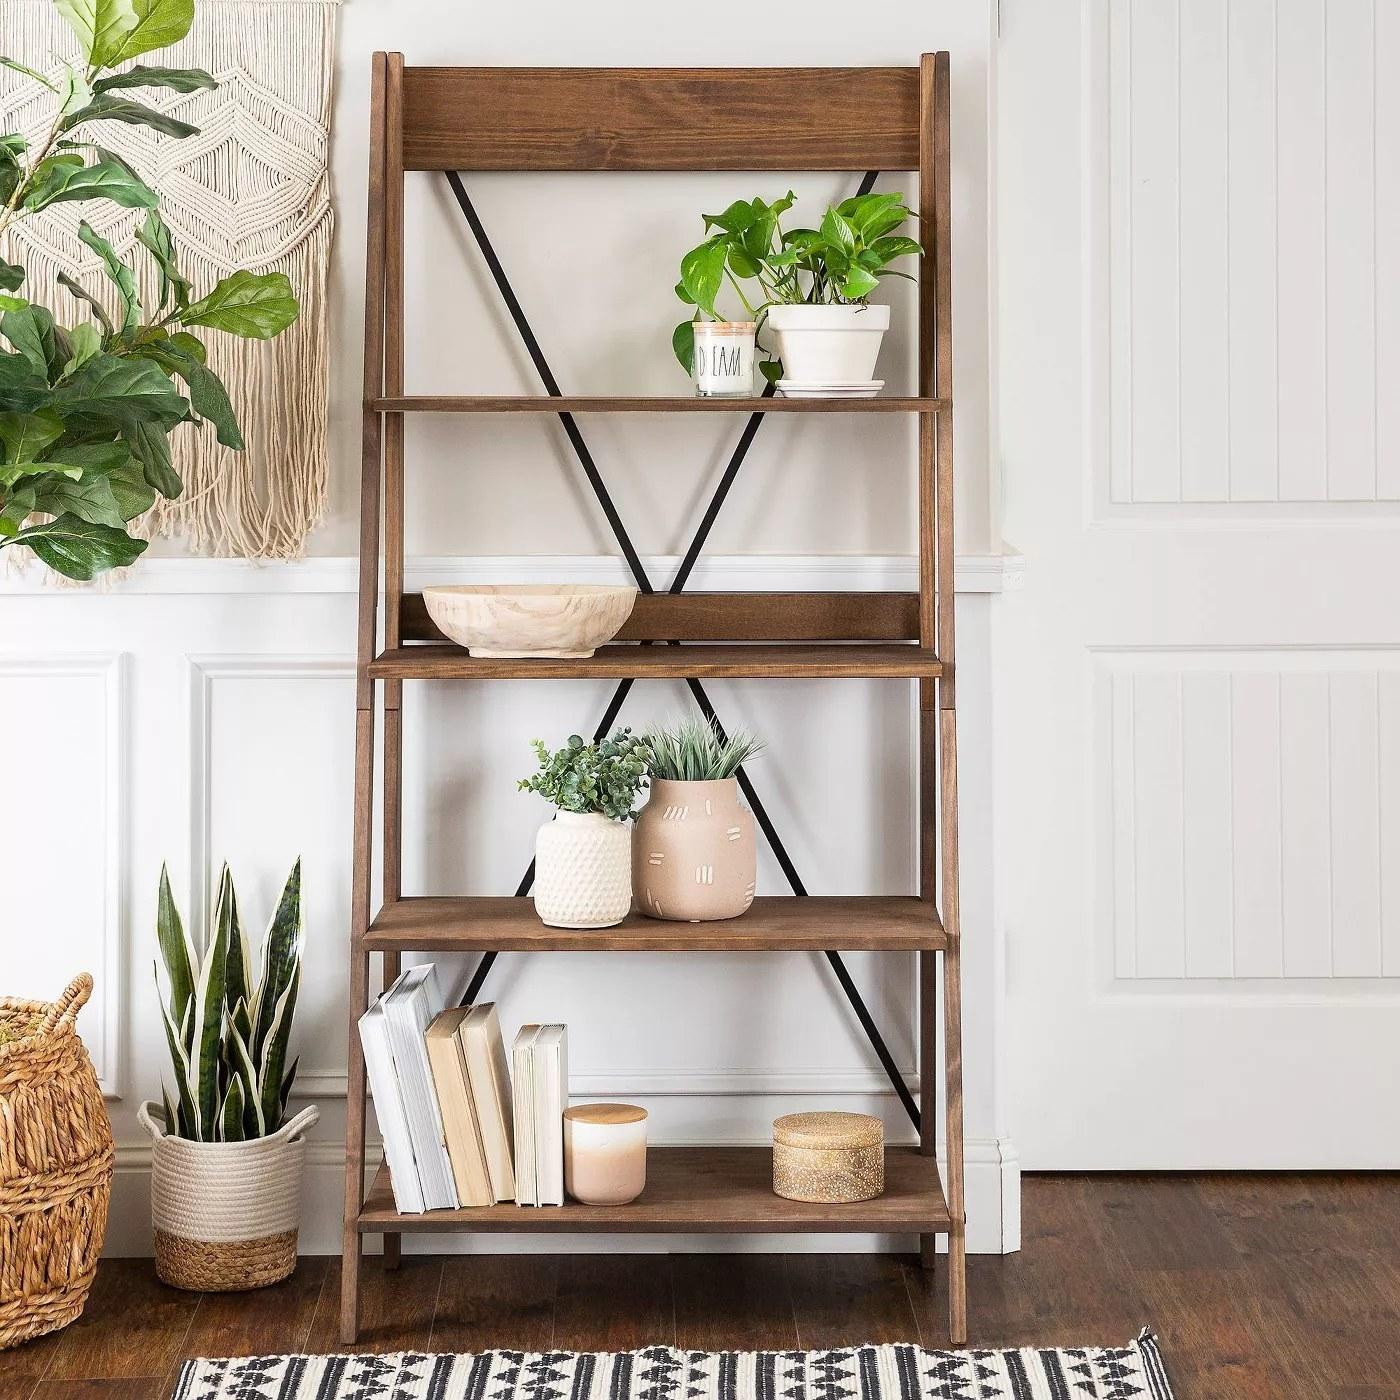 The ladder bookshelf in brown